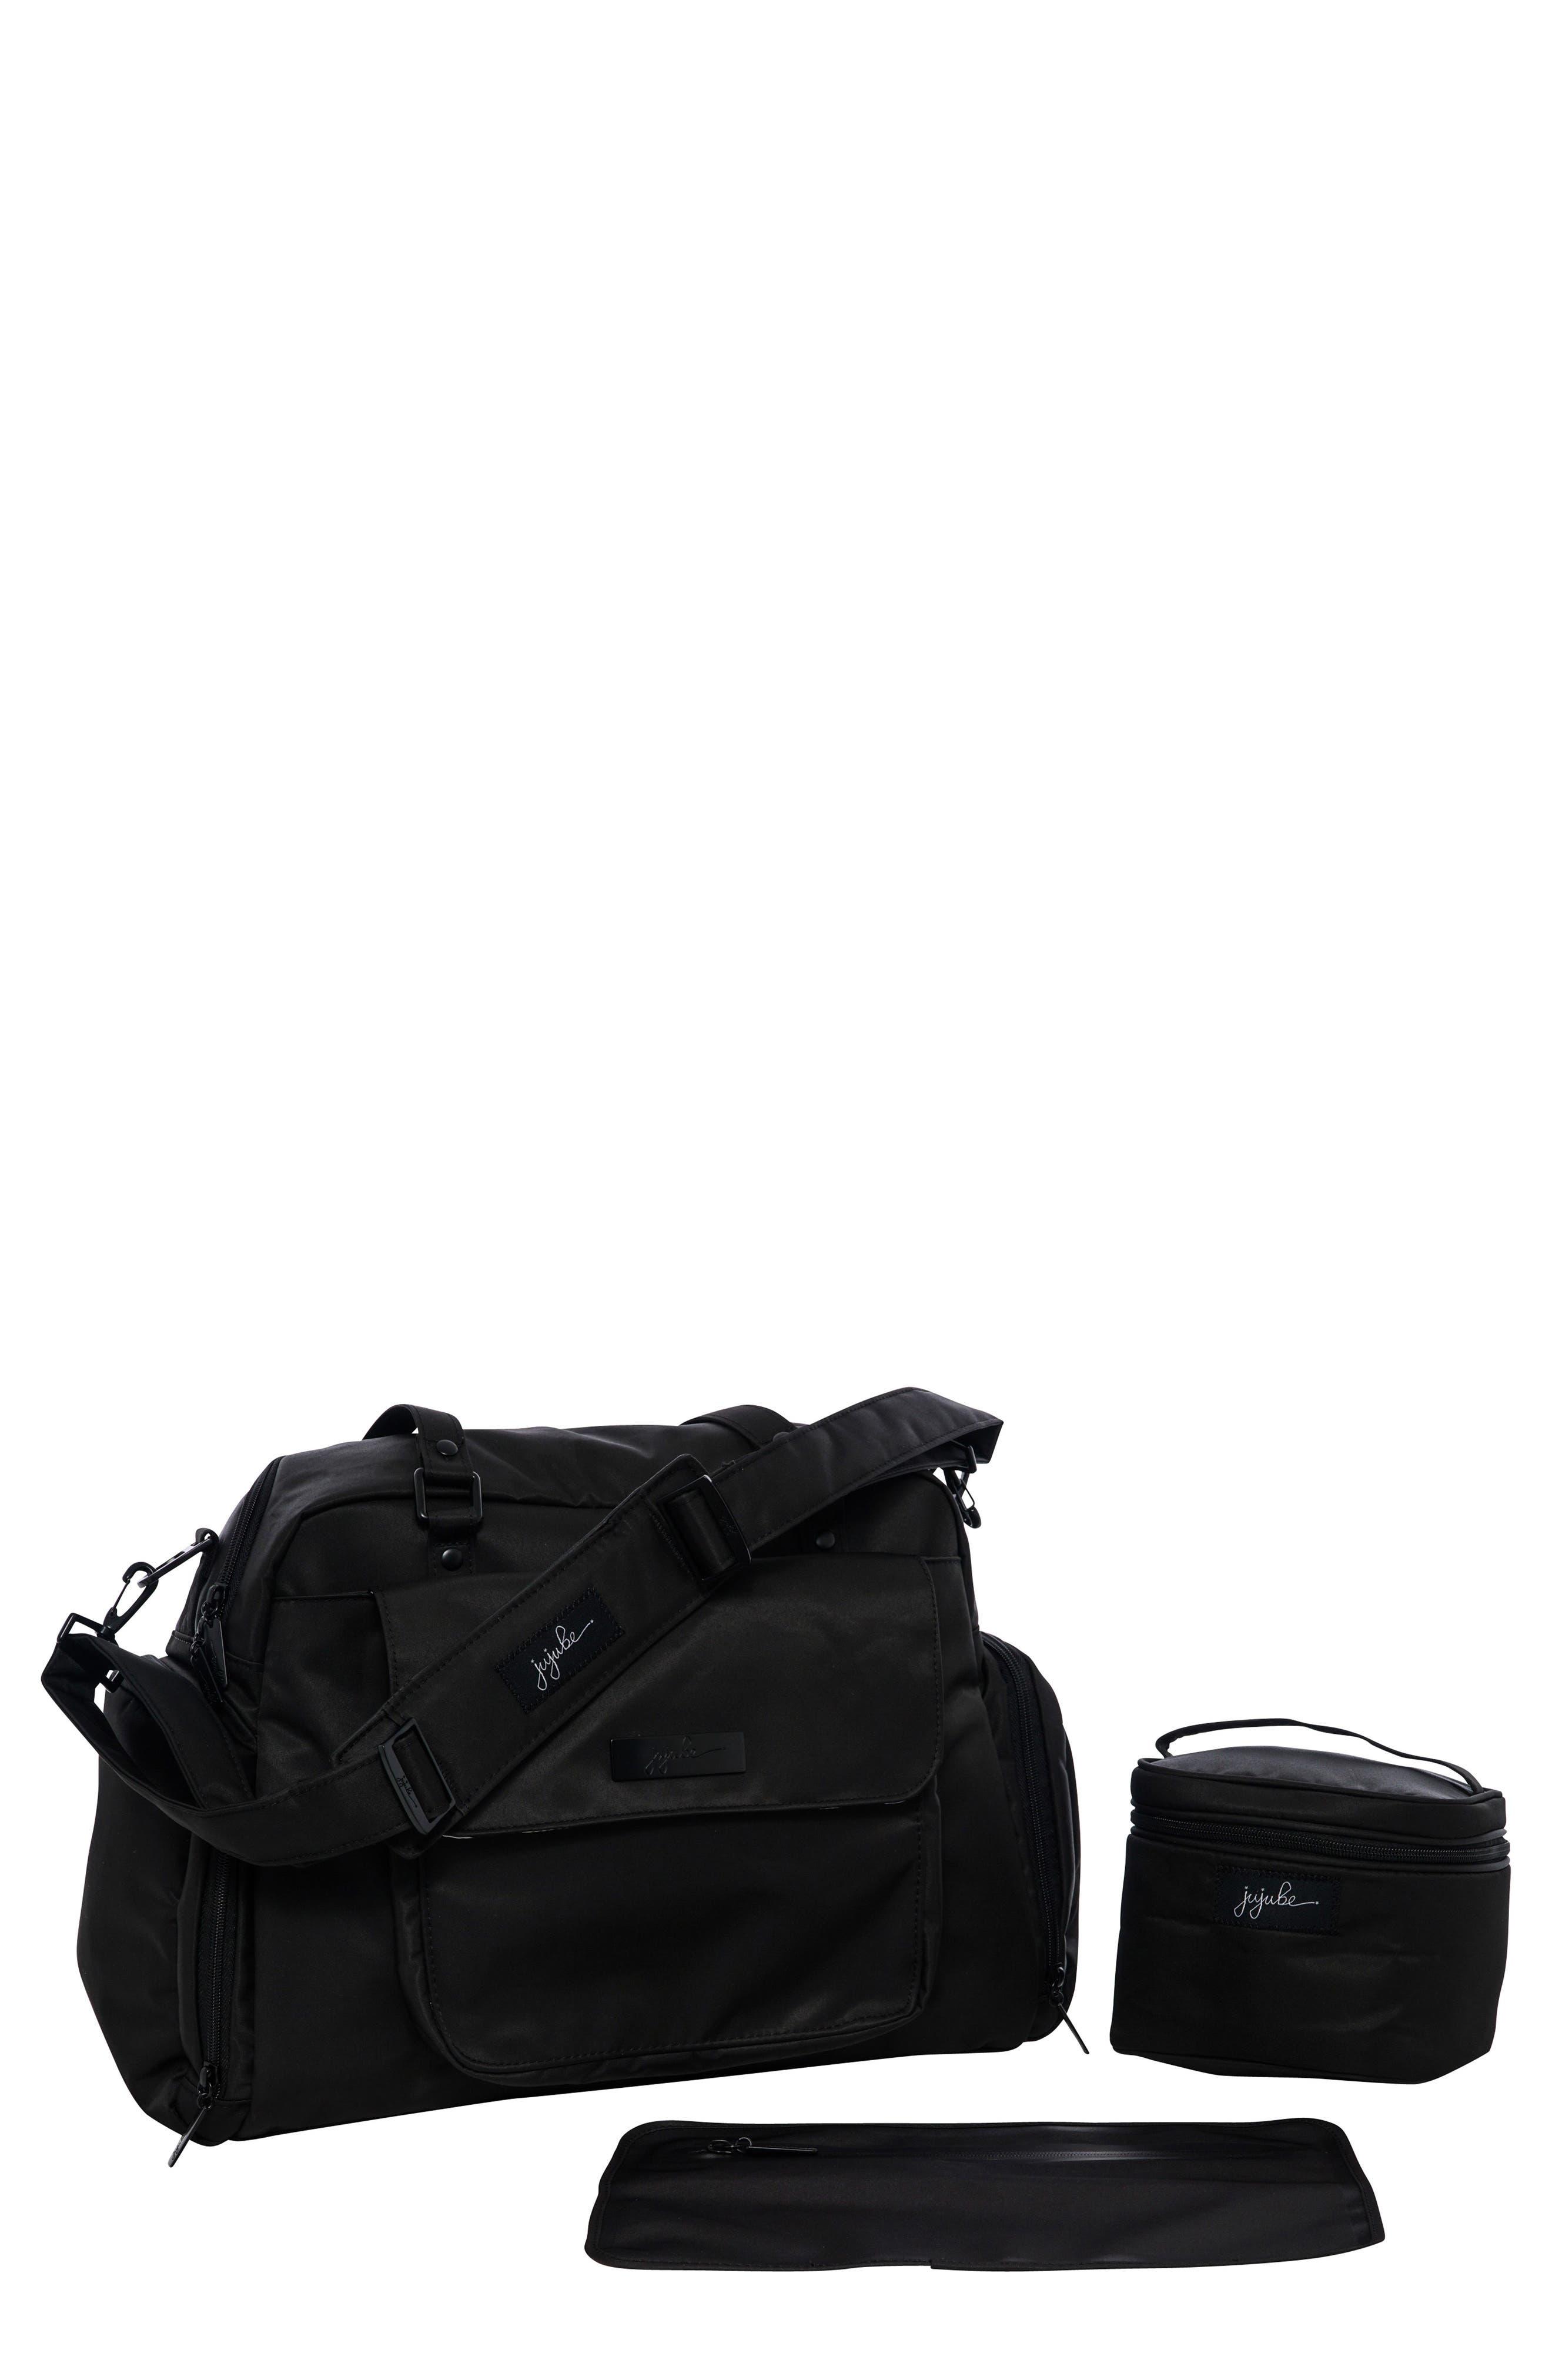 Onyx Be Pumped Bag,                         Main,                         color, Black Out